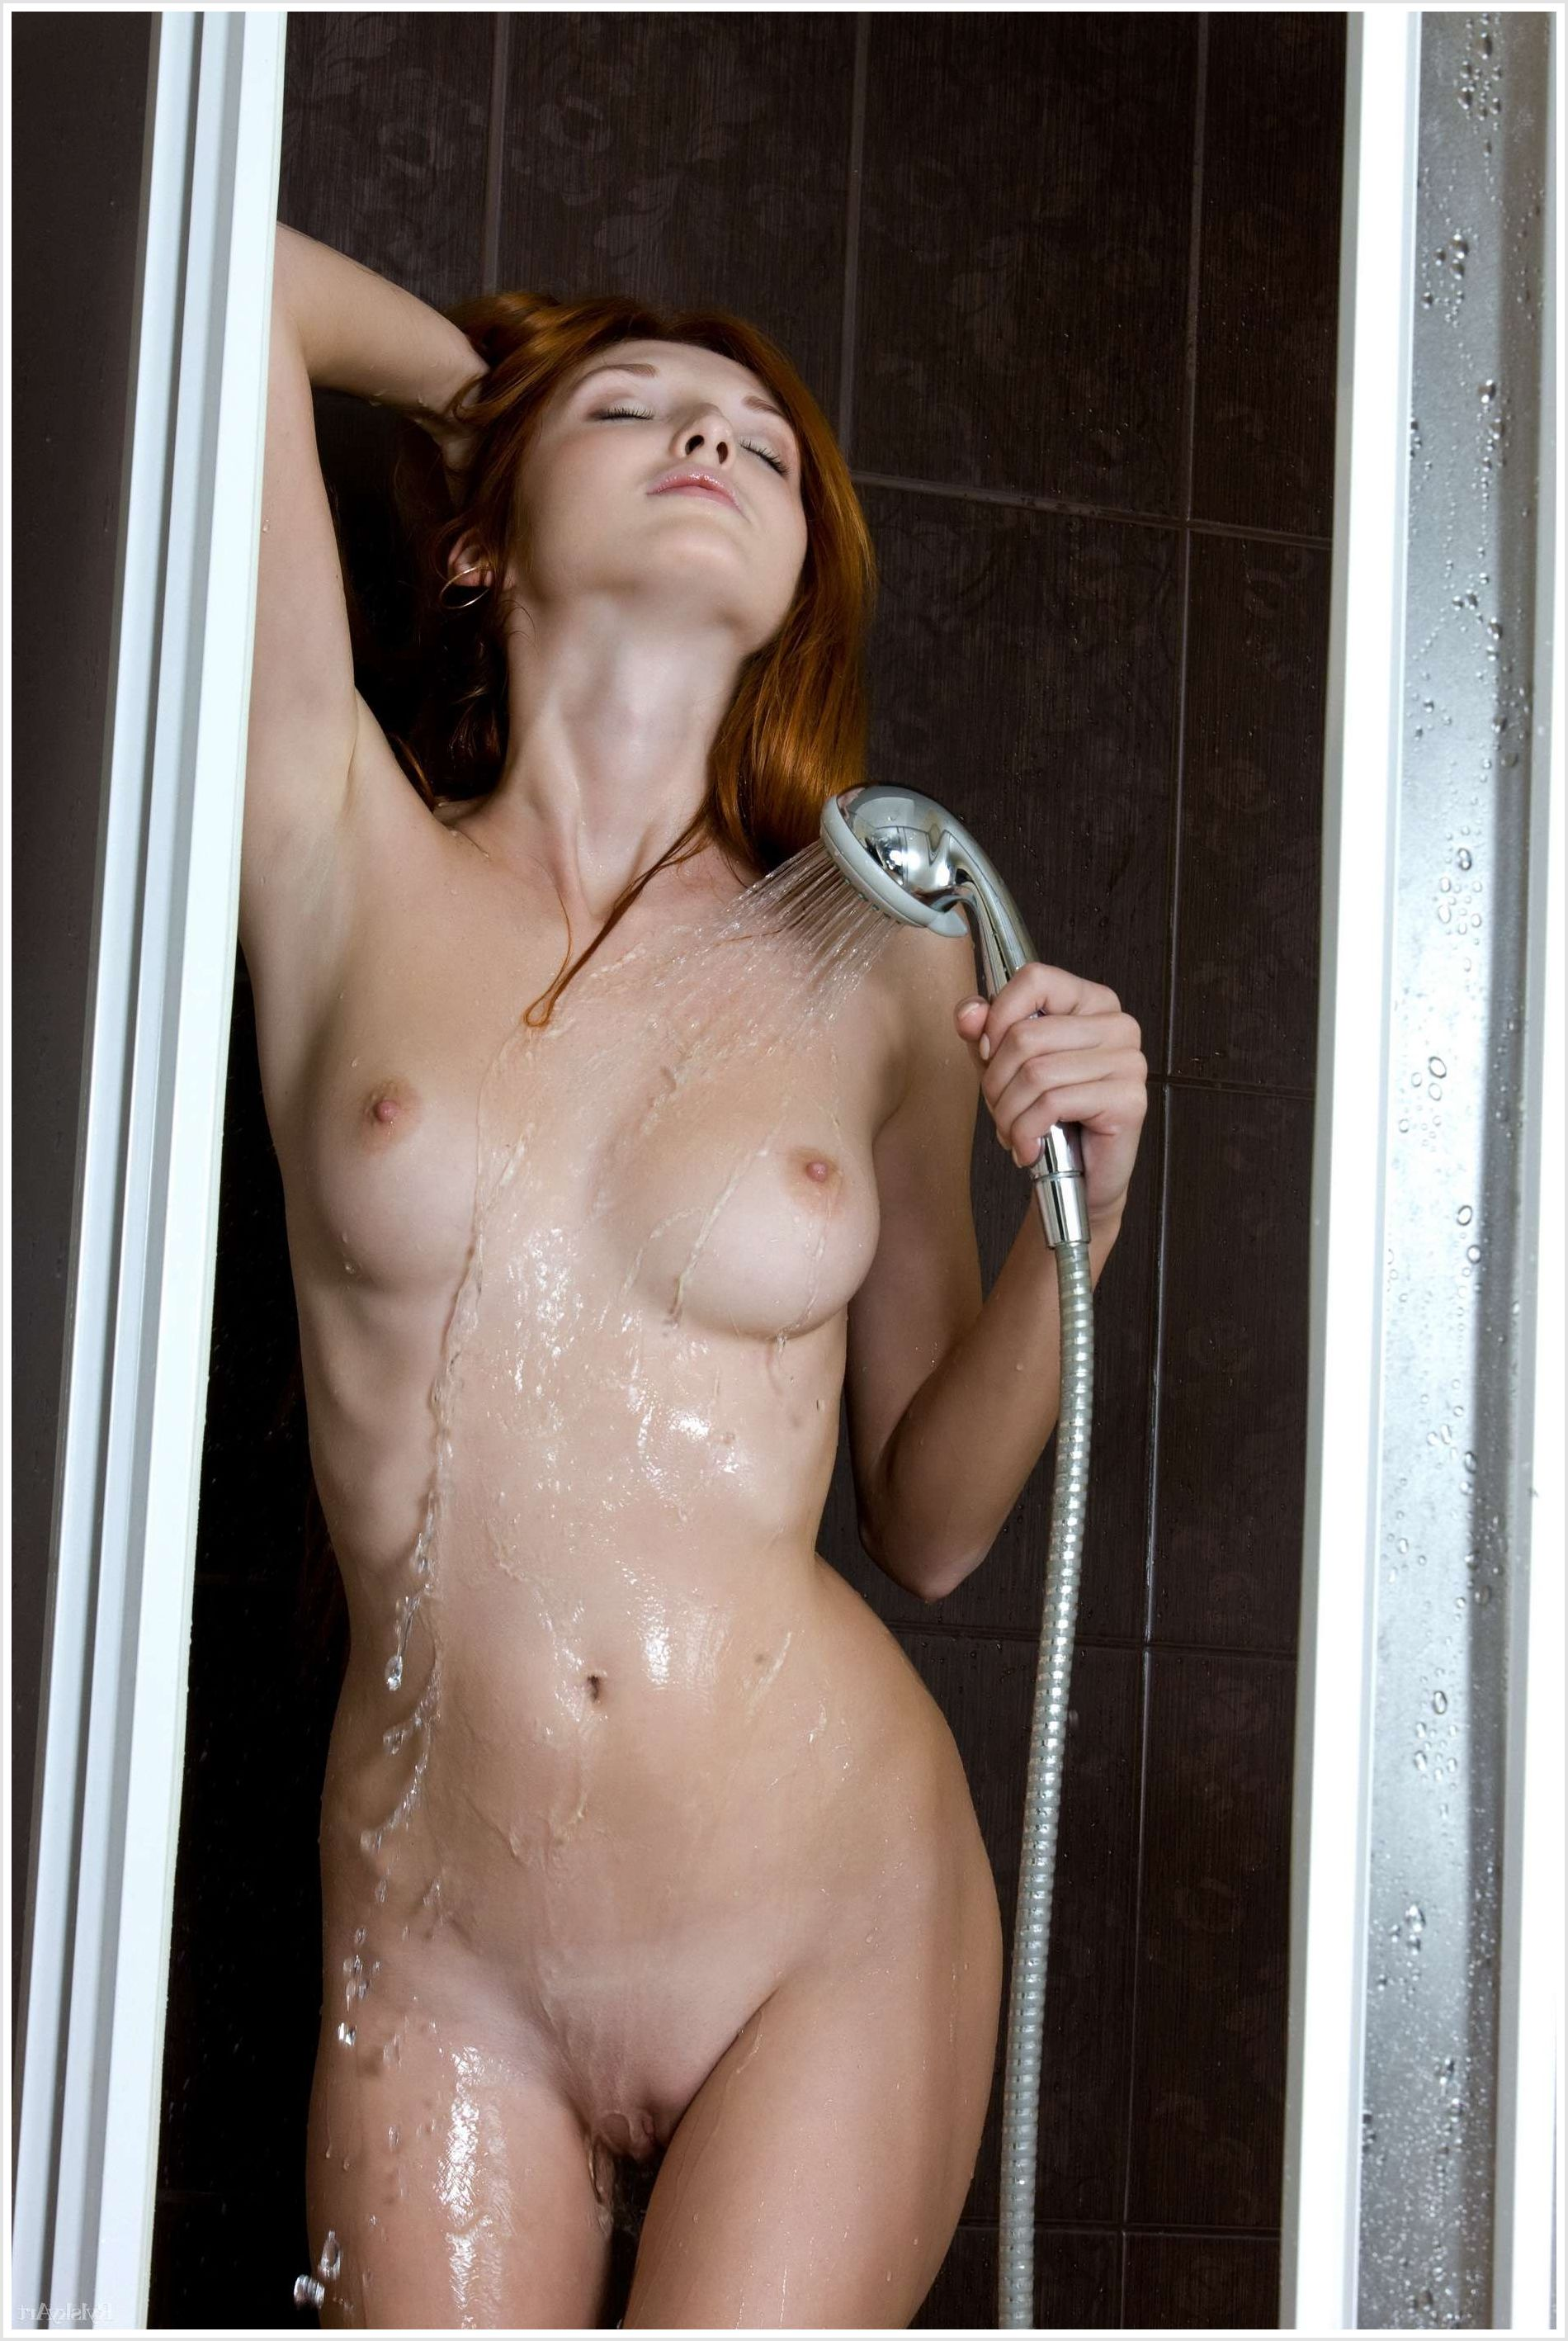 En naked shower video